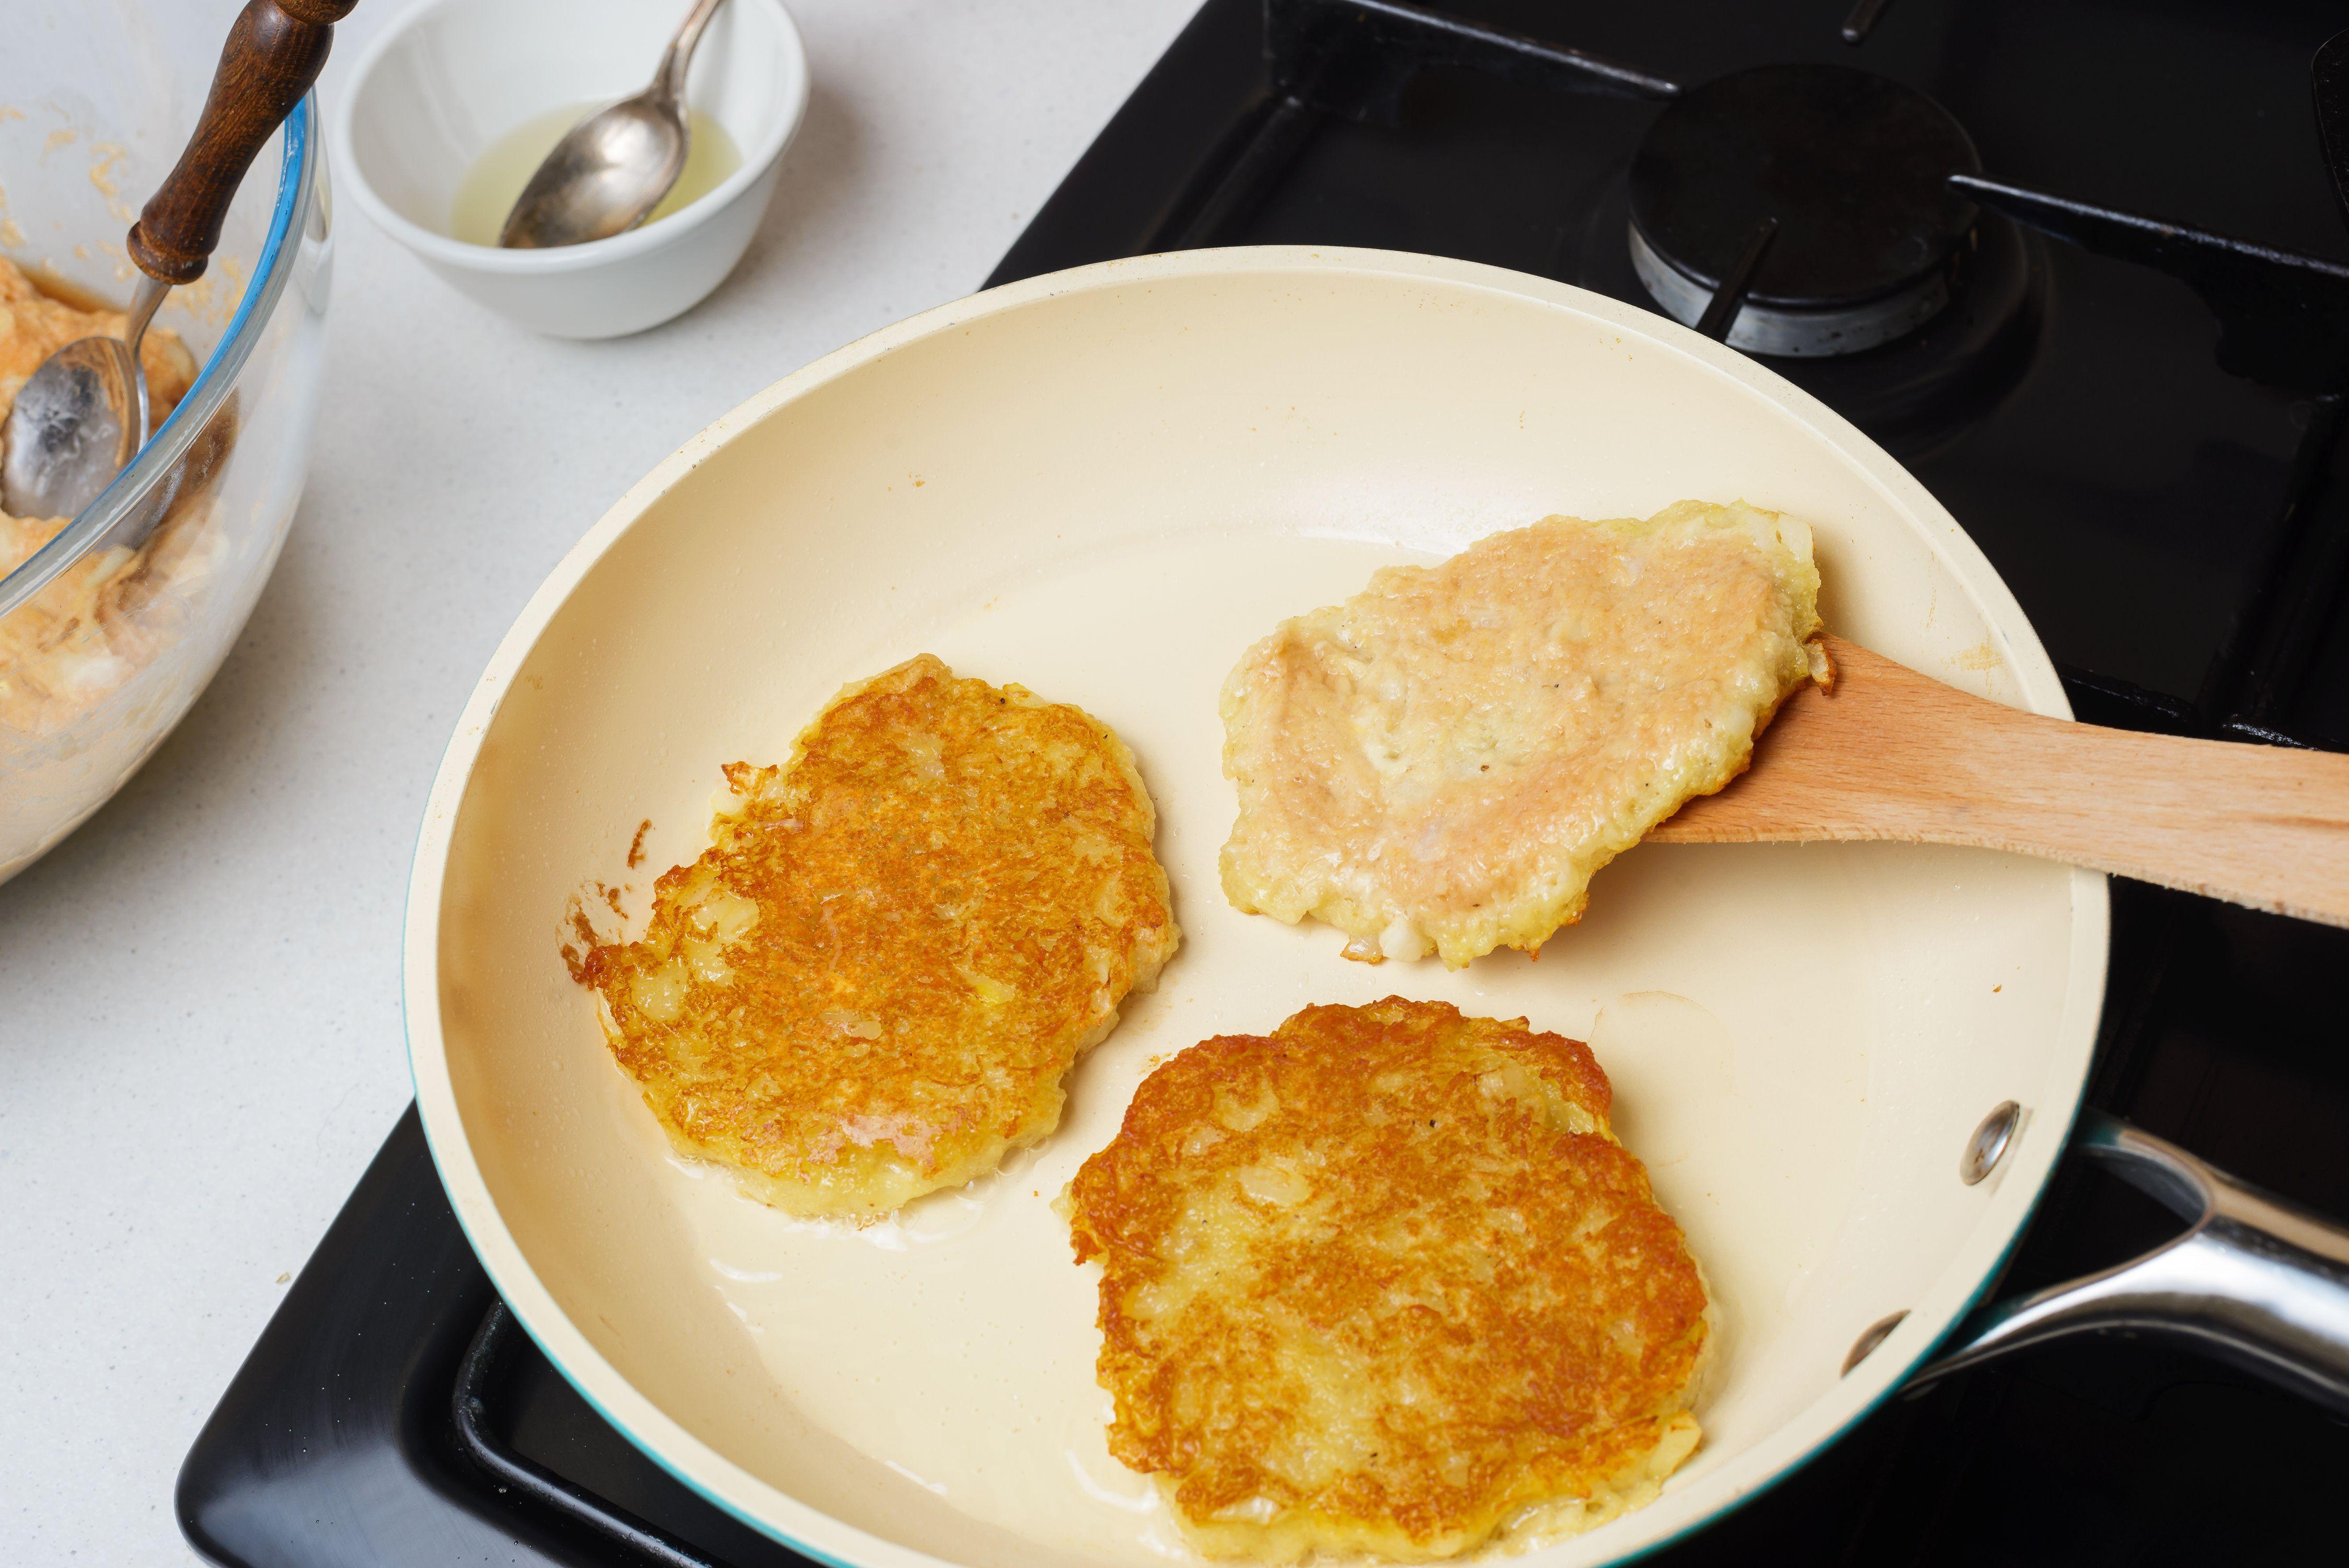 Cook latkes